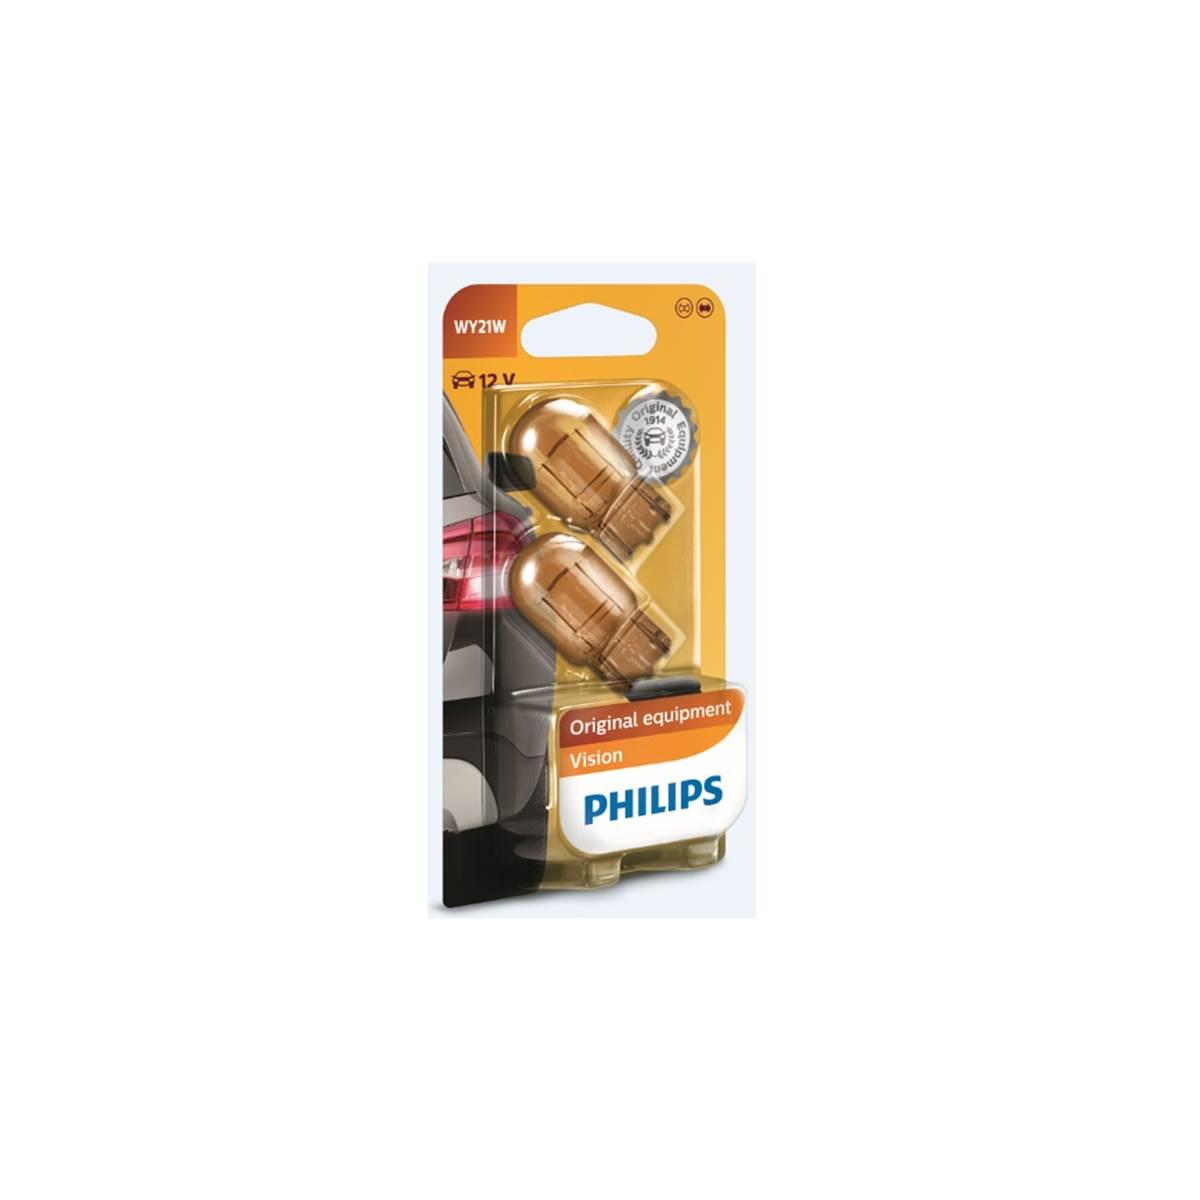 2 ampoules Philips premium Vision WY21W